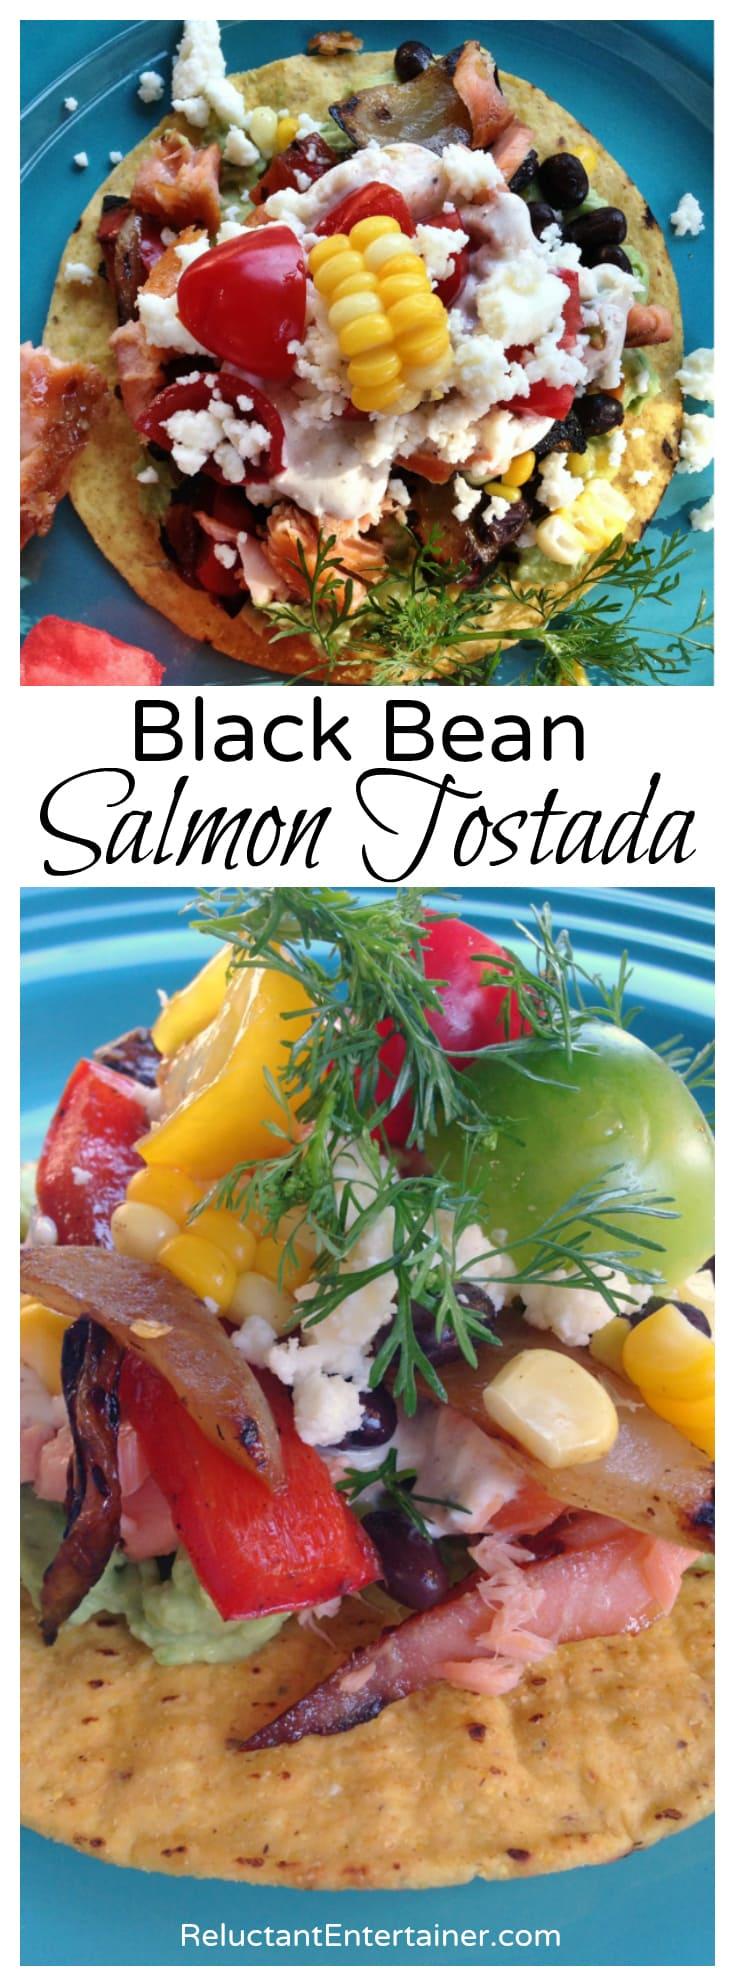 Black Bean Salmon Tostada